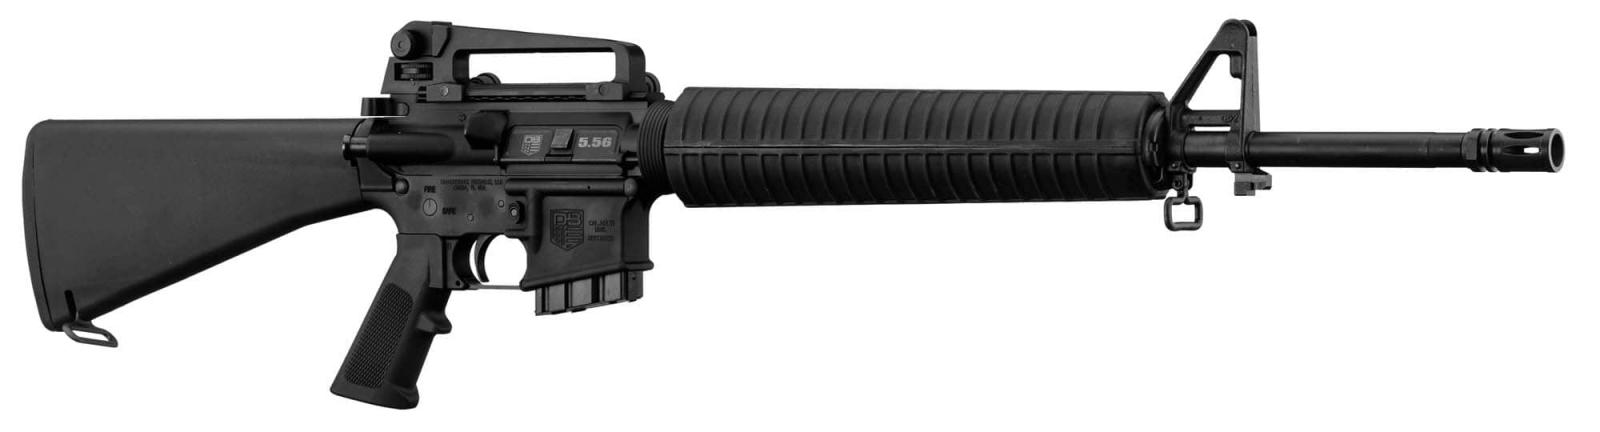 Carabine type AR15 DIAMONDBACK modèle DB16 USB Version T.A.R